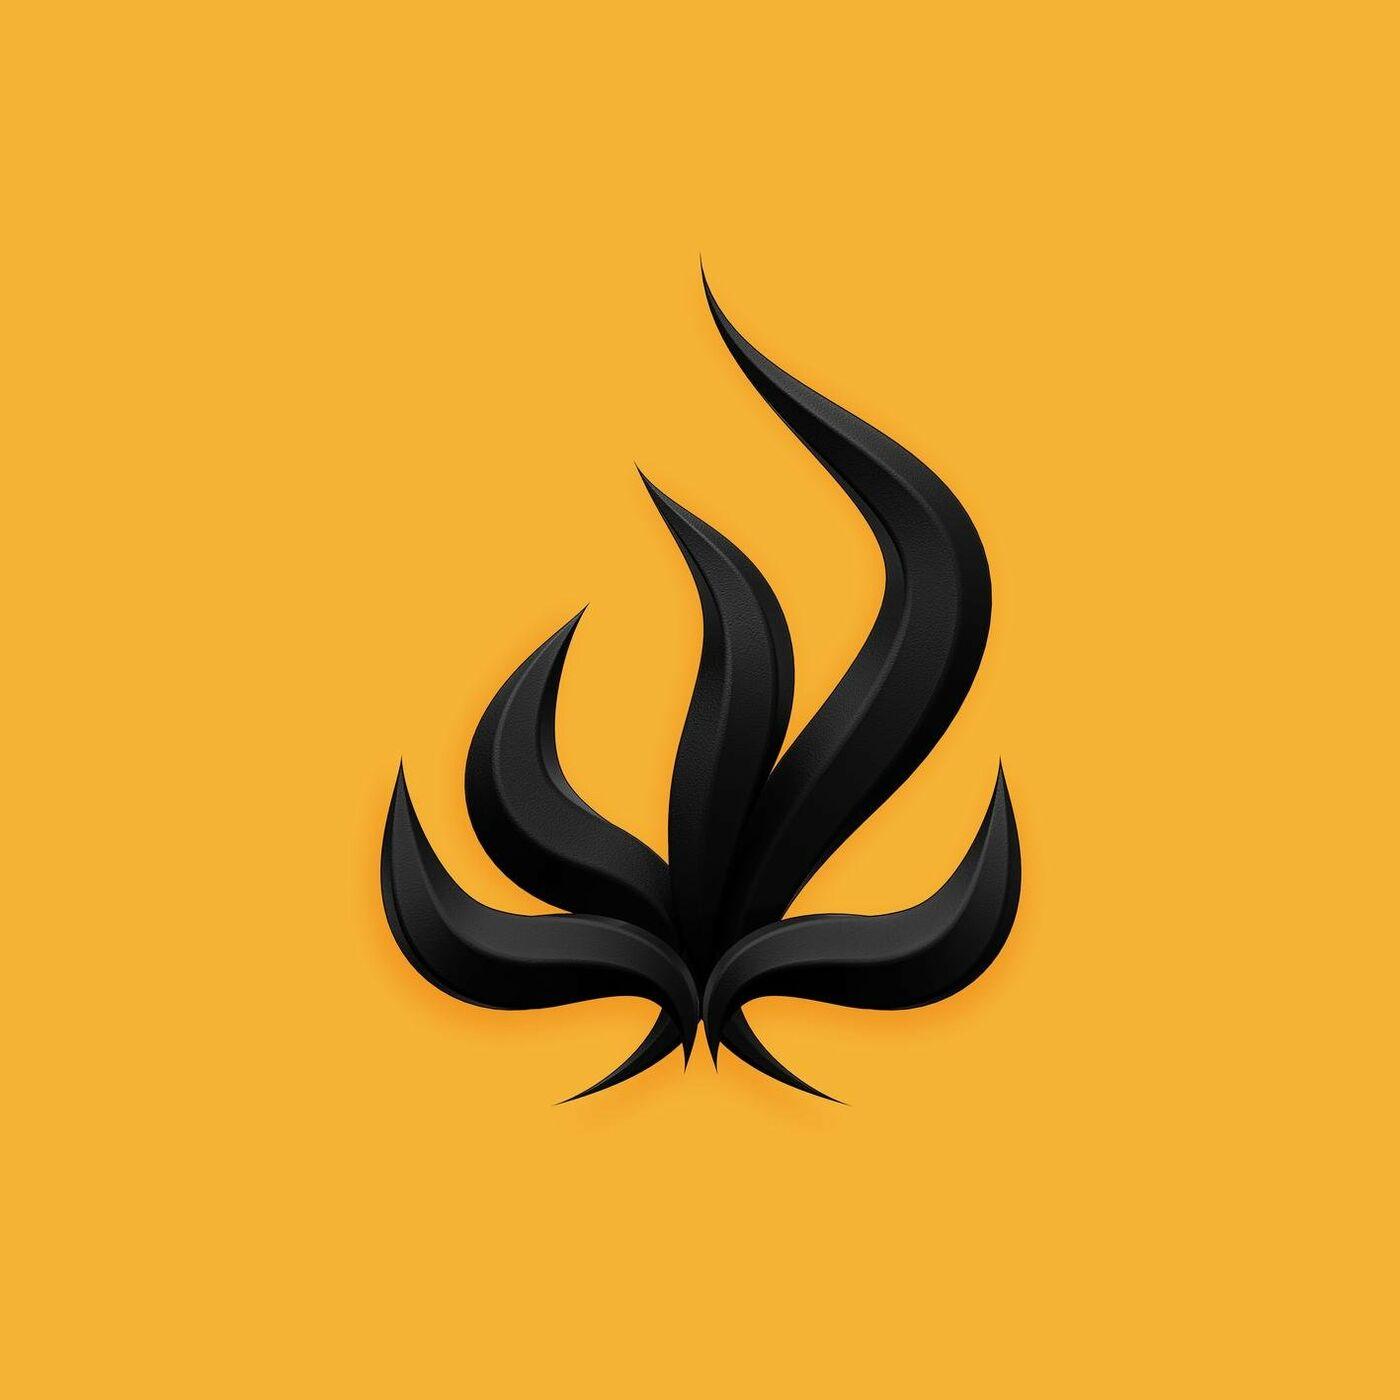 Bury Tomorrow - Black Flame (Deluxe) (2019)